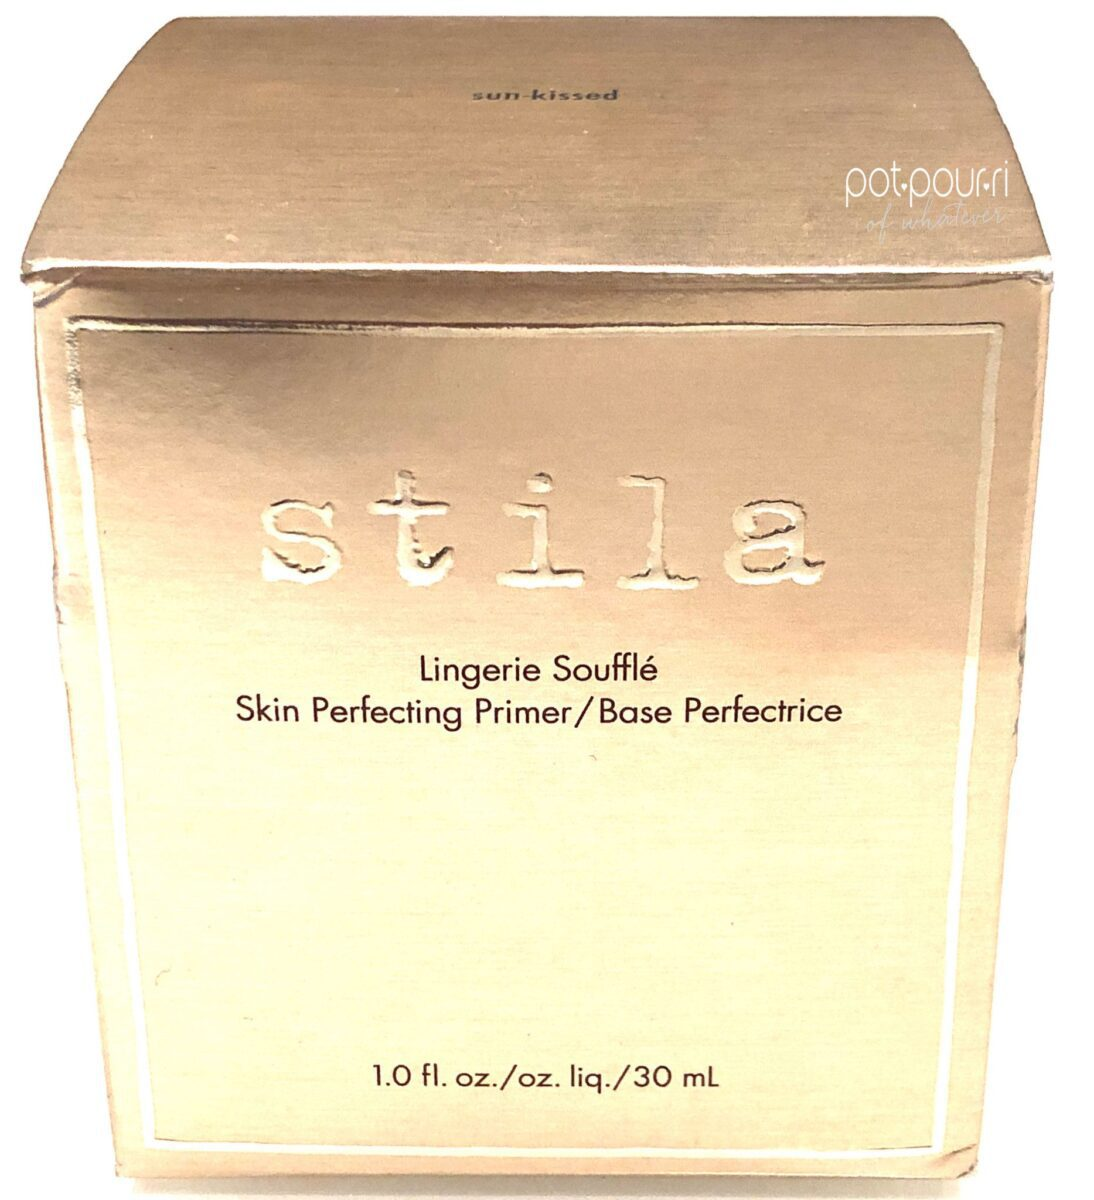 packaging outer box Stila skin perfecter Primer